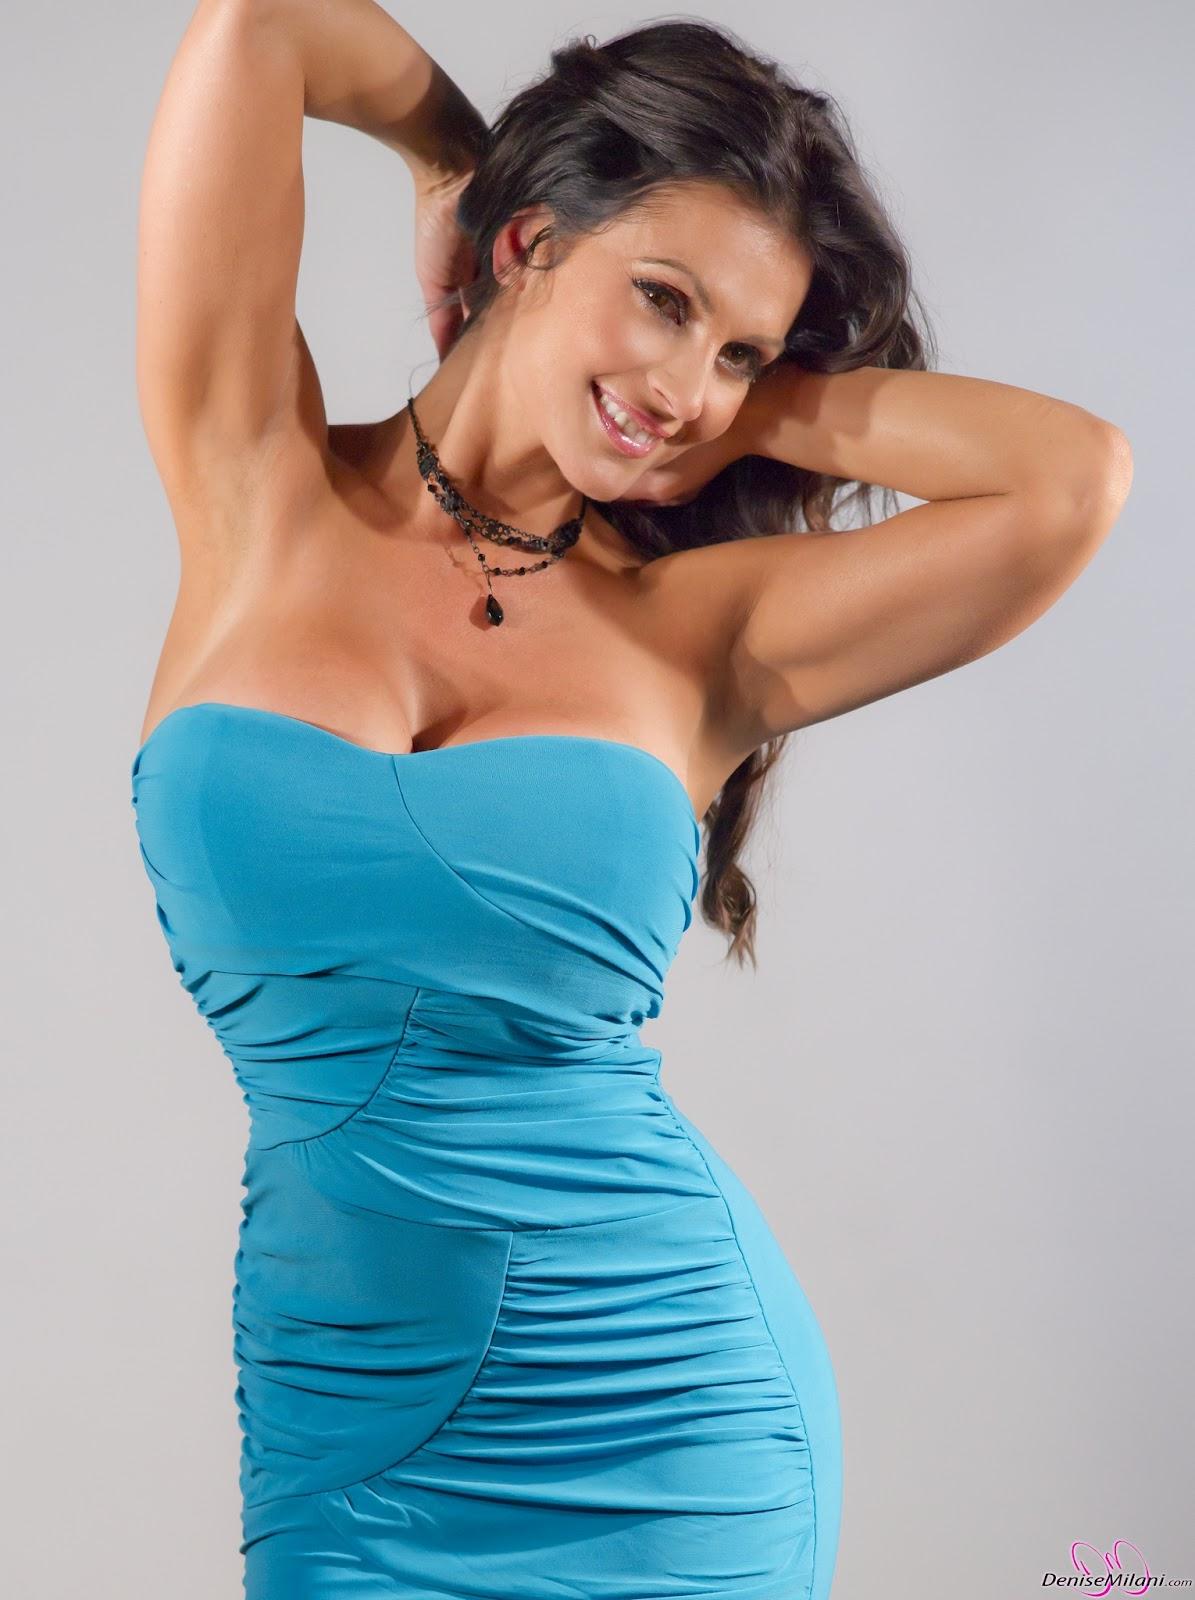 denise milani blue dress - photo #7